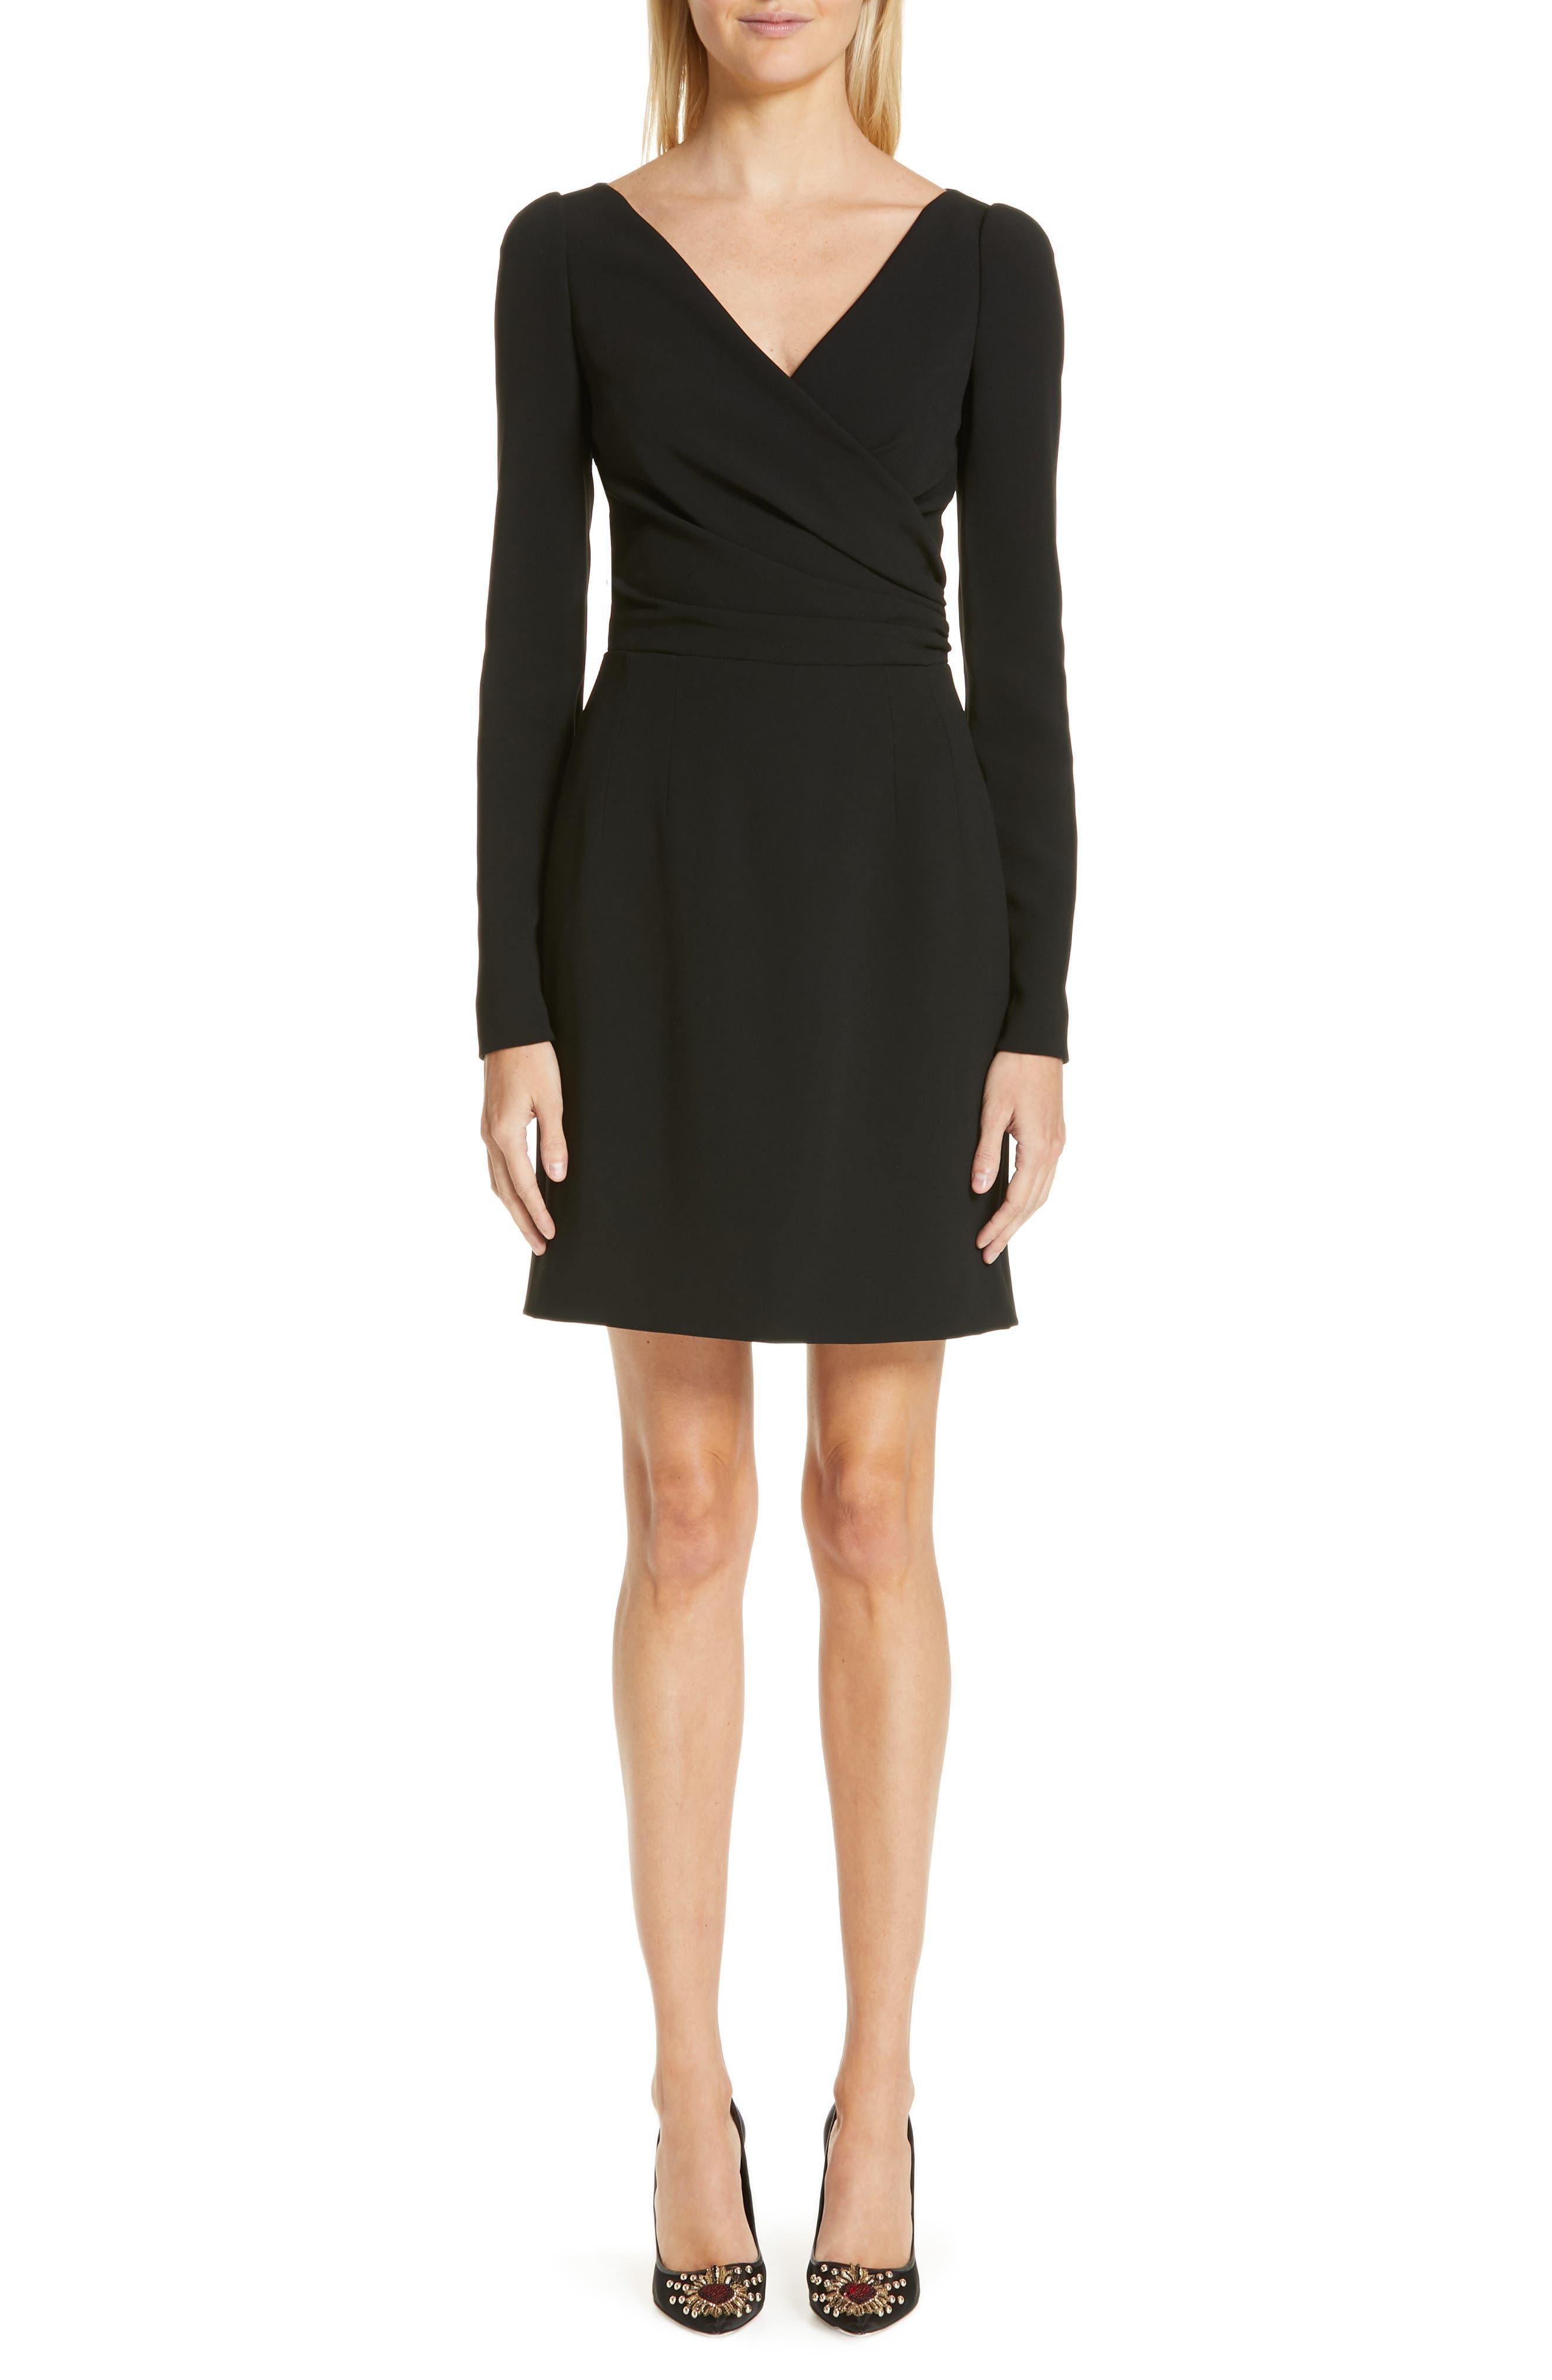 Dolce & gabbana Surplice Dress, US / 46 IT - Black